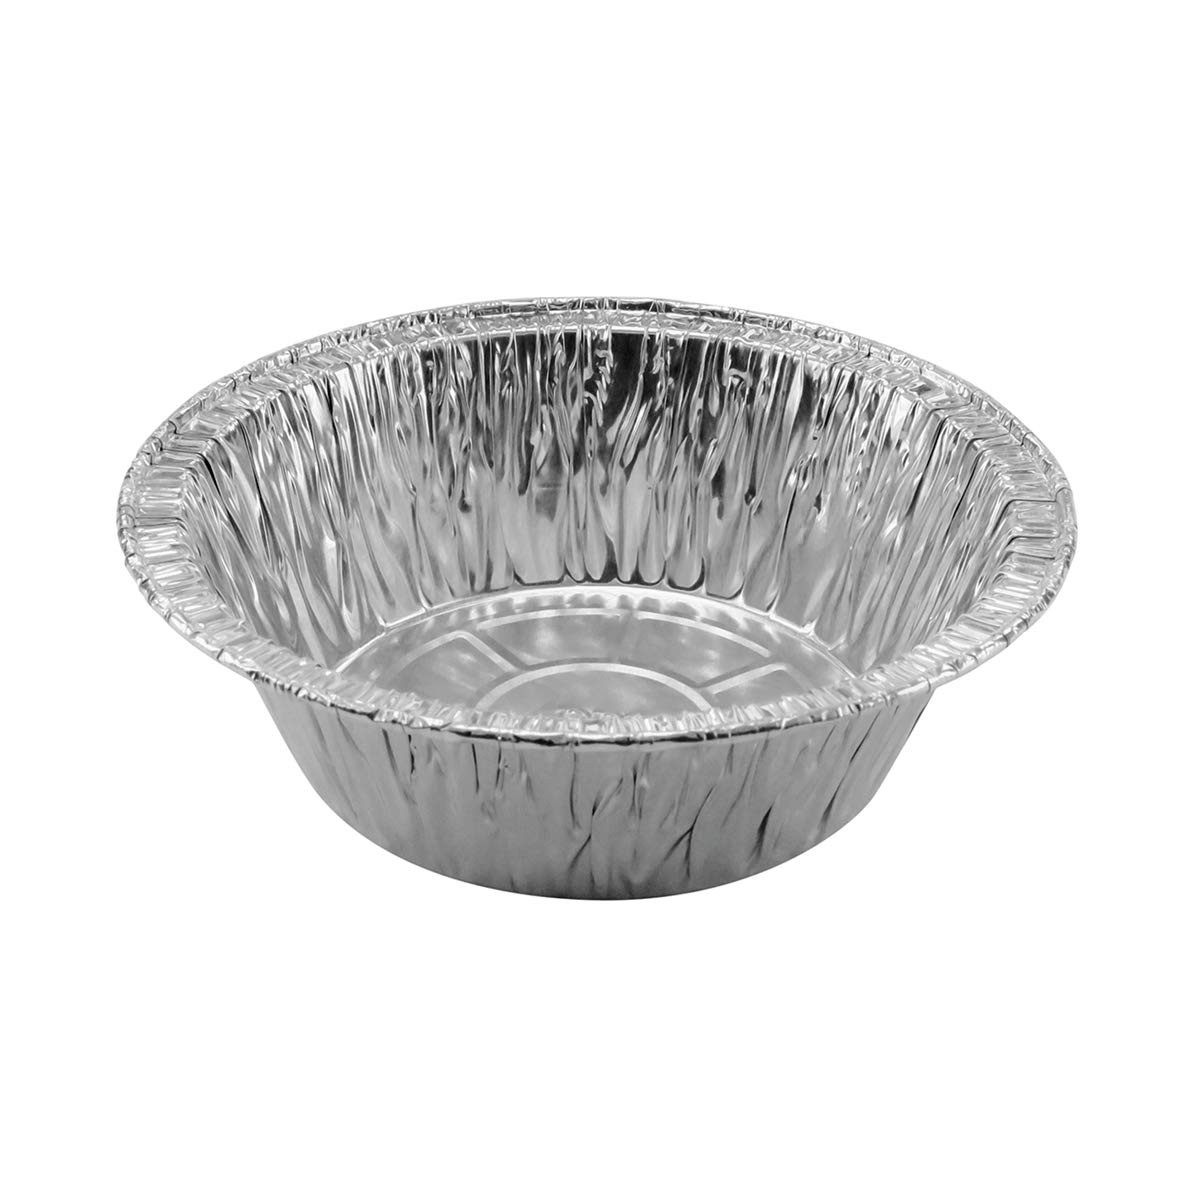 Disposable Aluminum 5 3/4 Extra Deep Meat/Pot Pie Pan #2400 (1,000) by KitchenDance (Image #4)